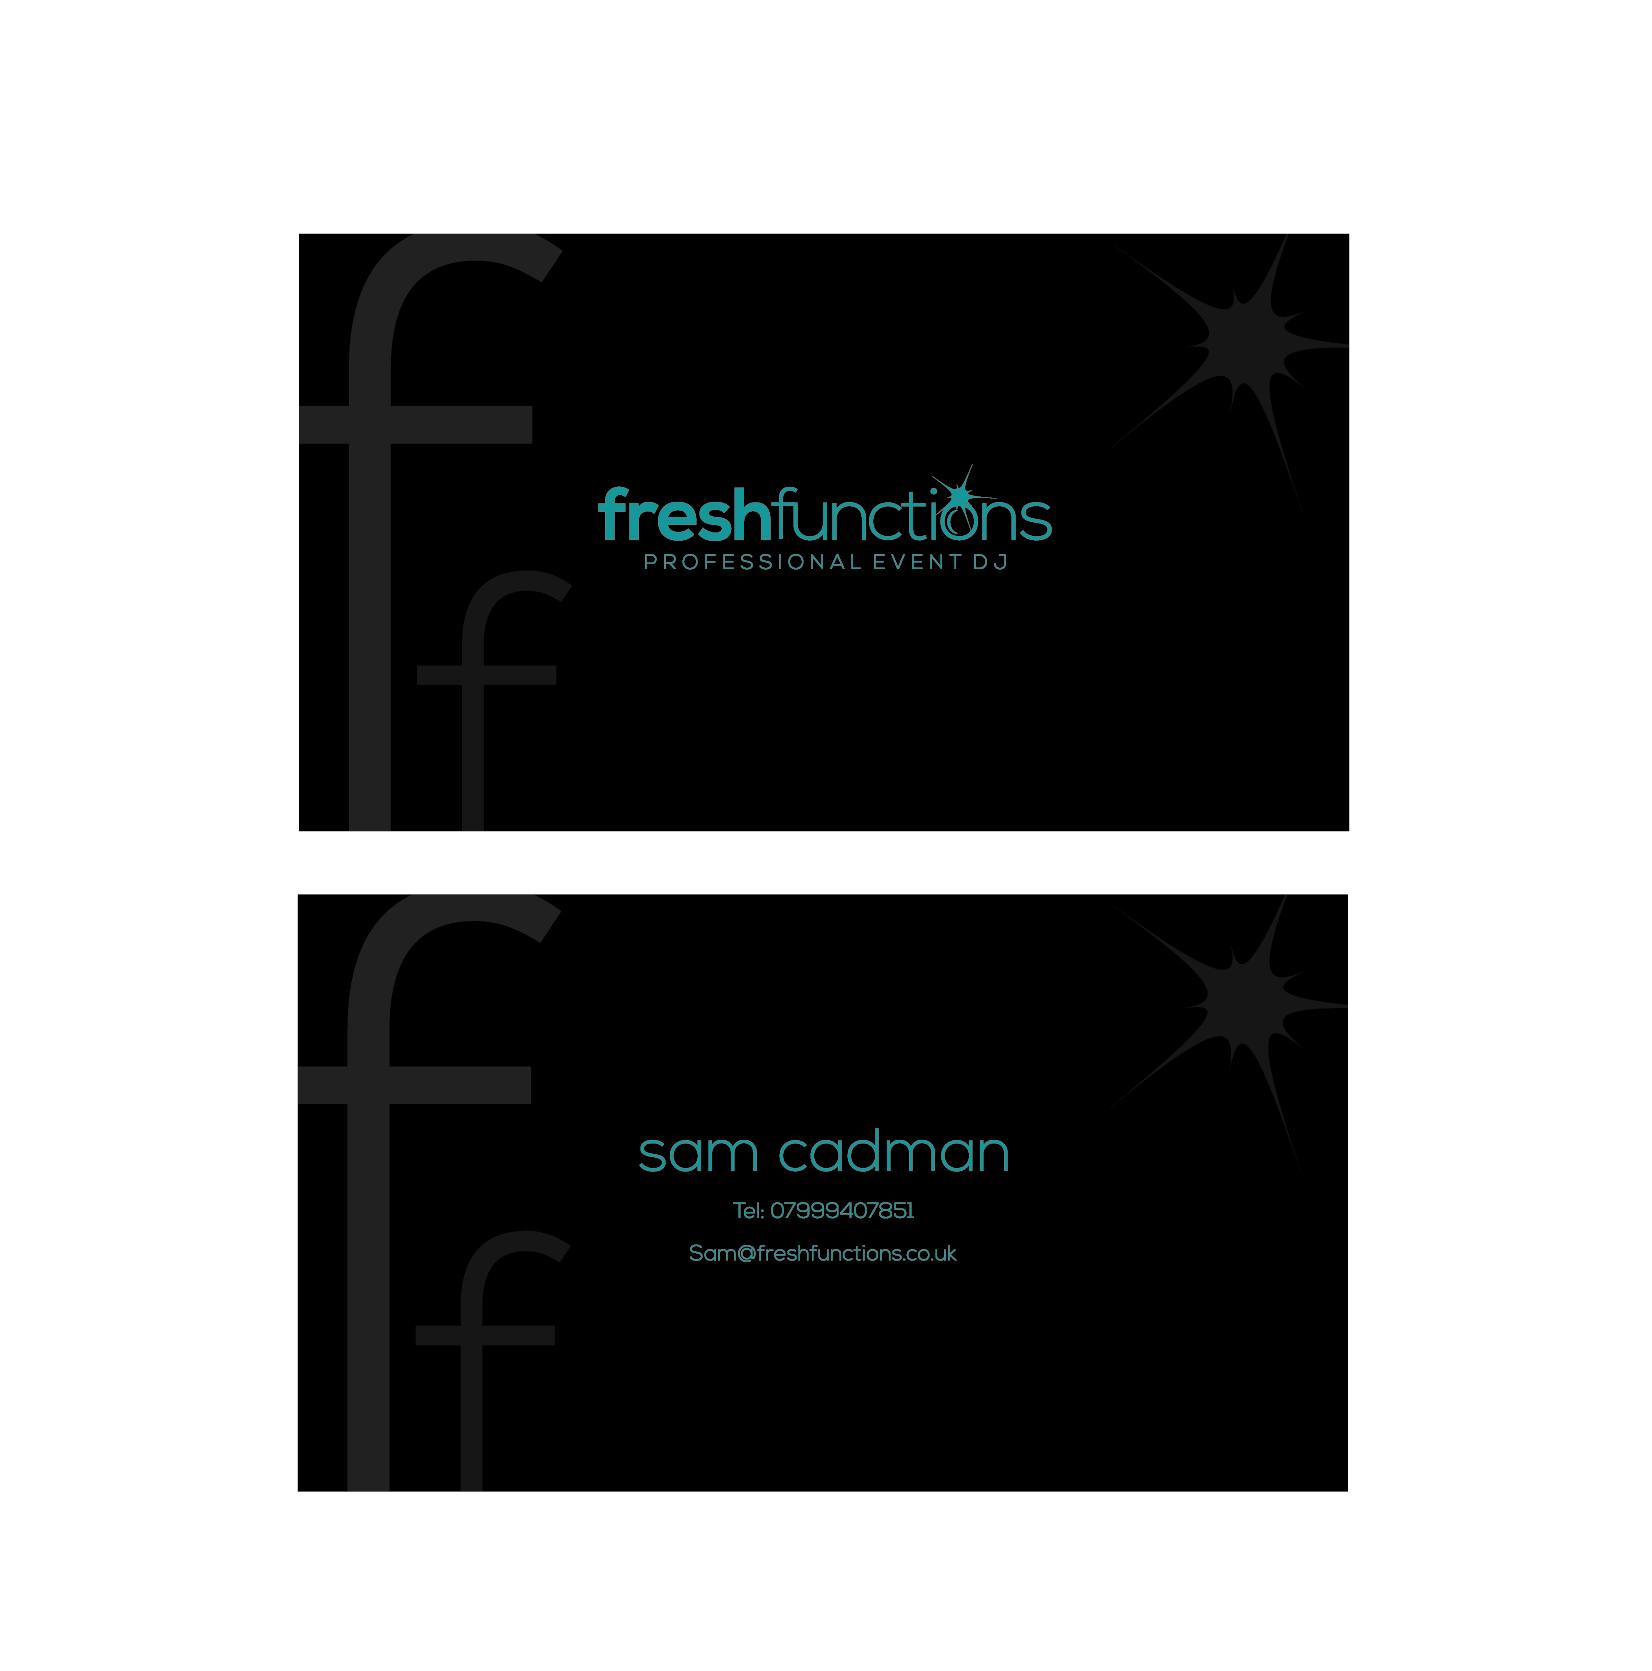 Create business cards